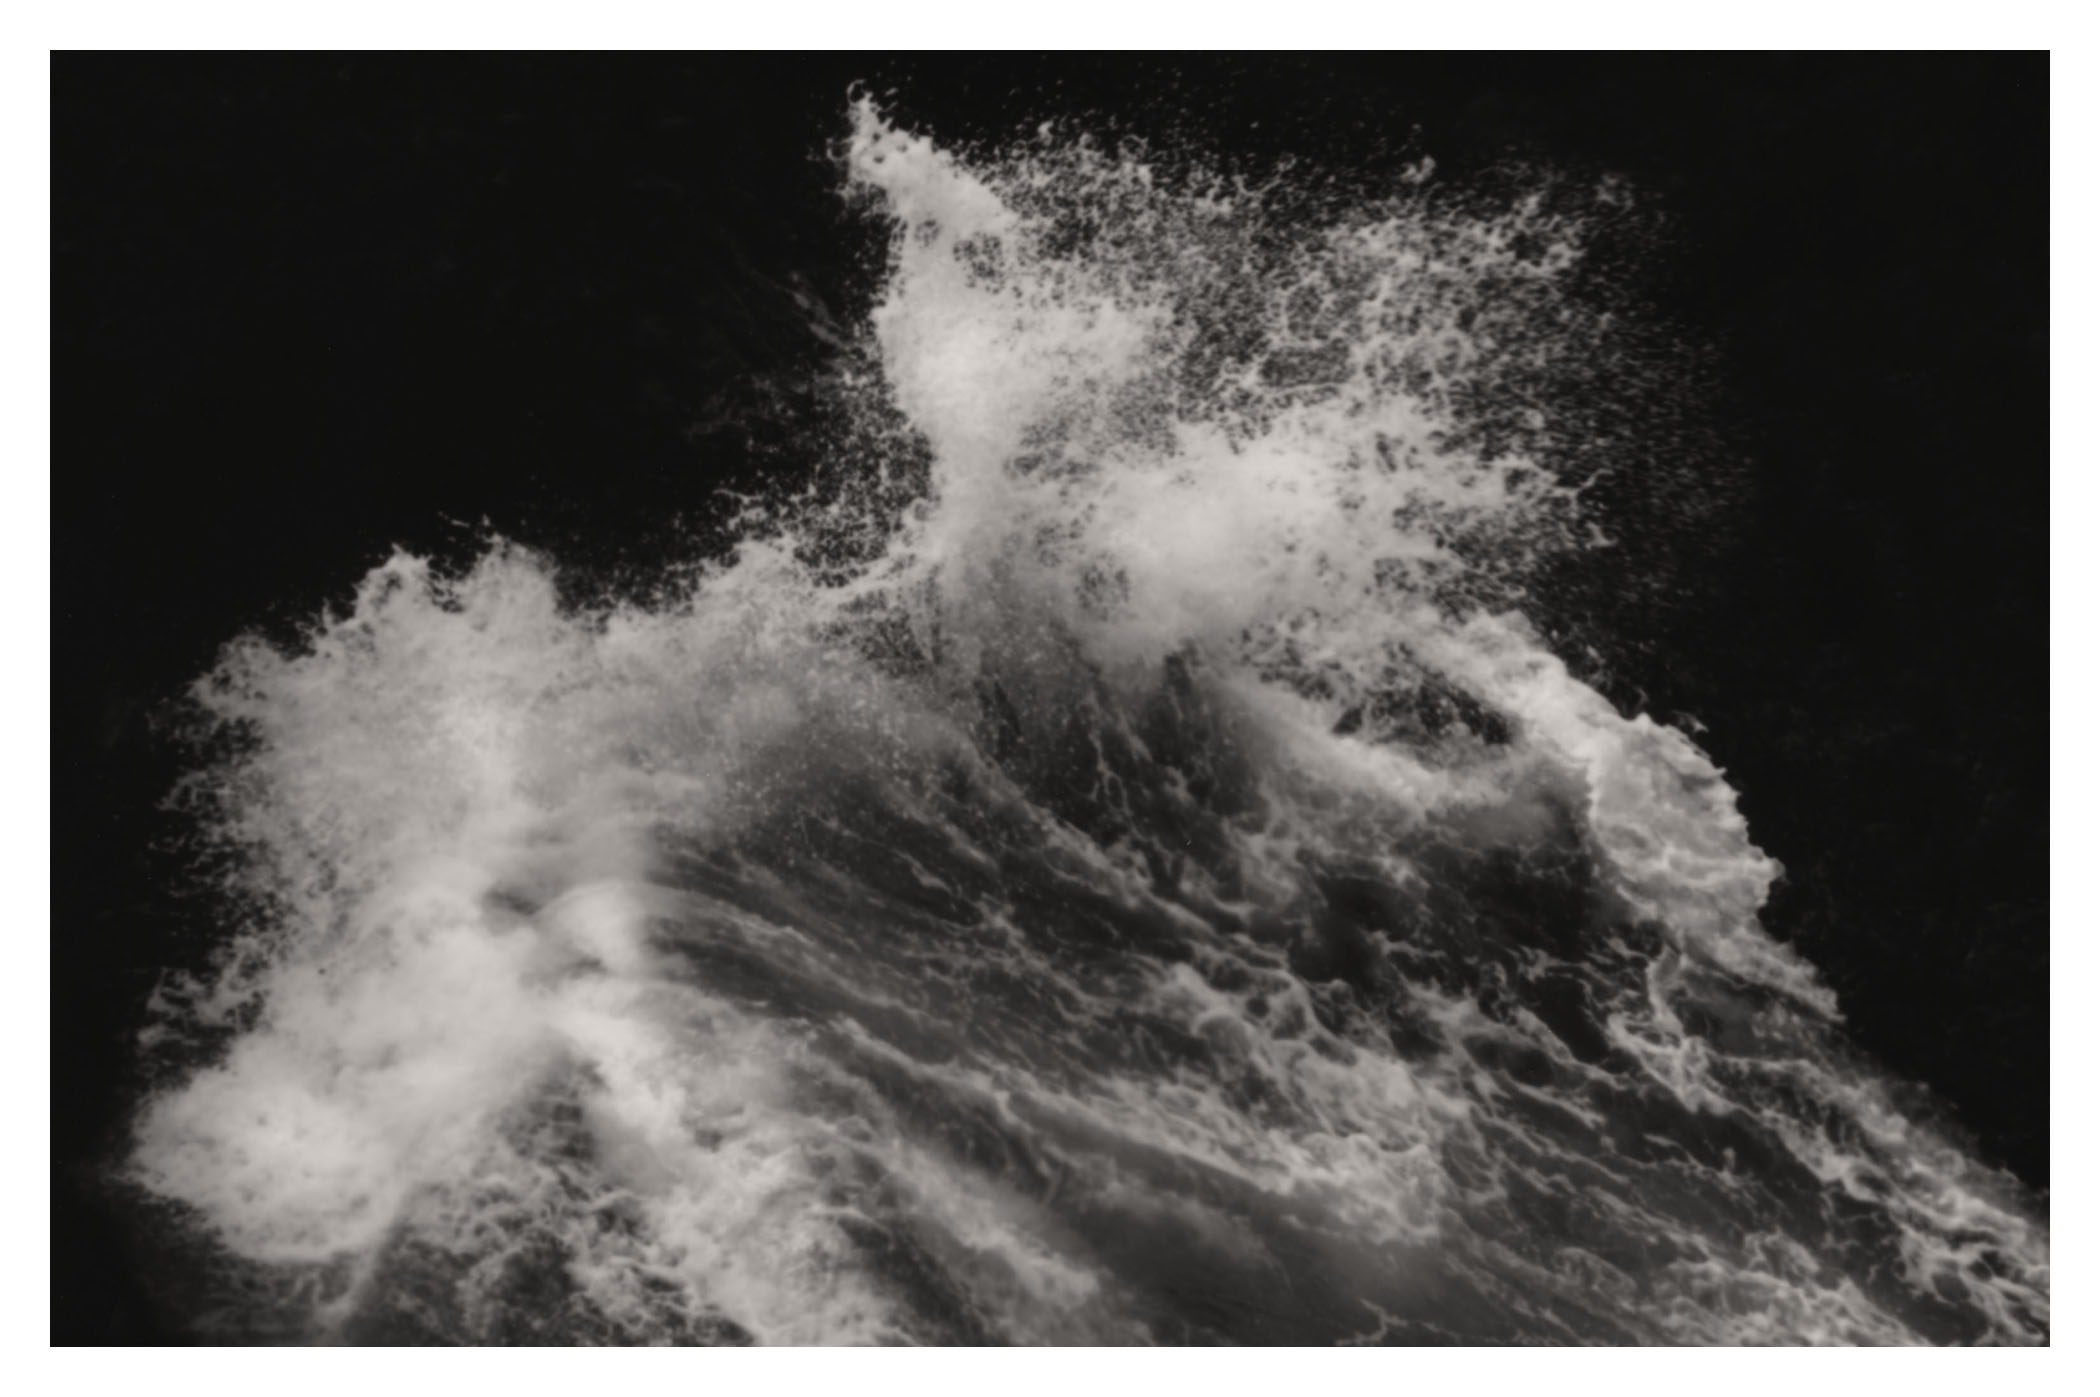 Dark Water (2)